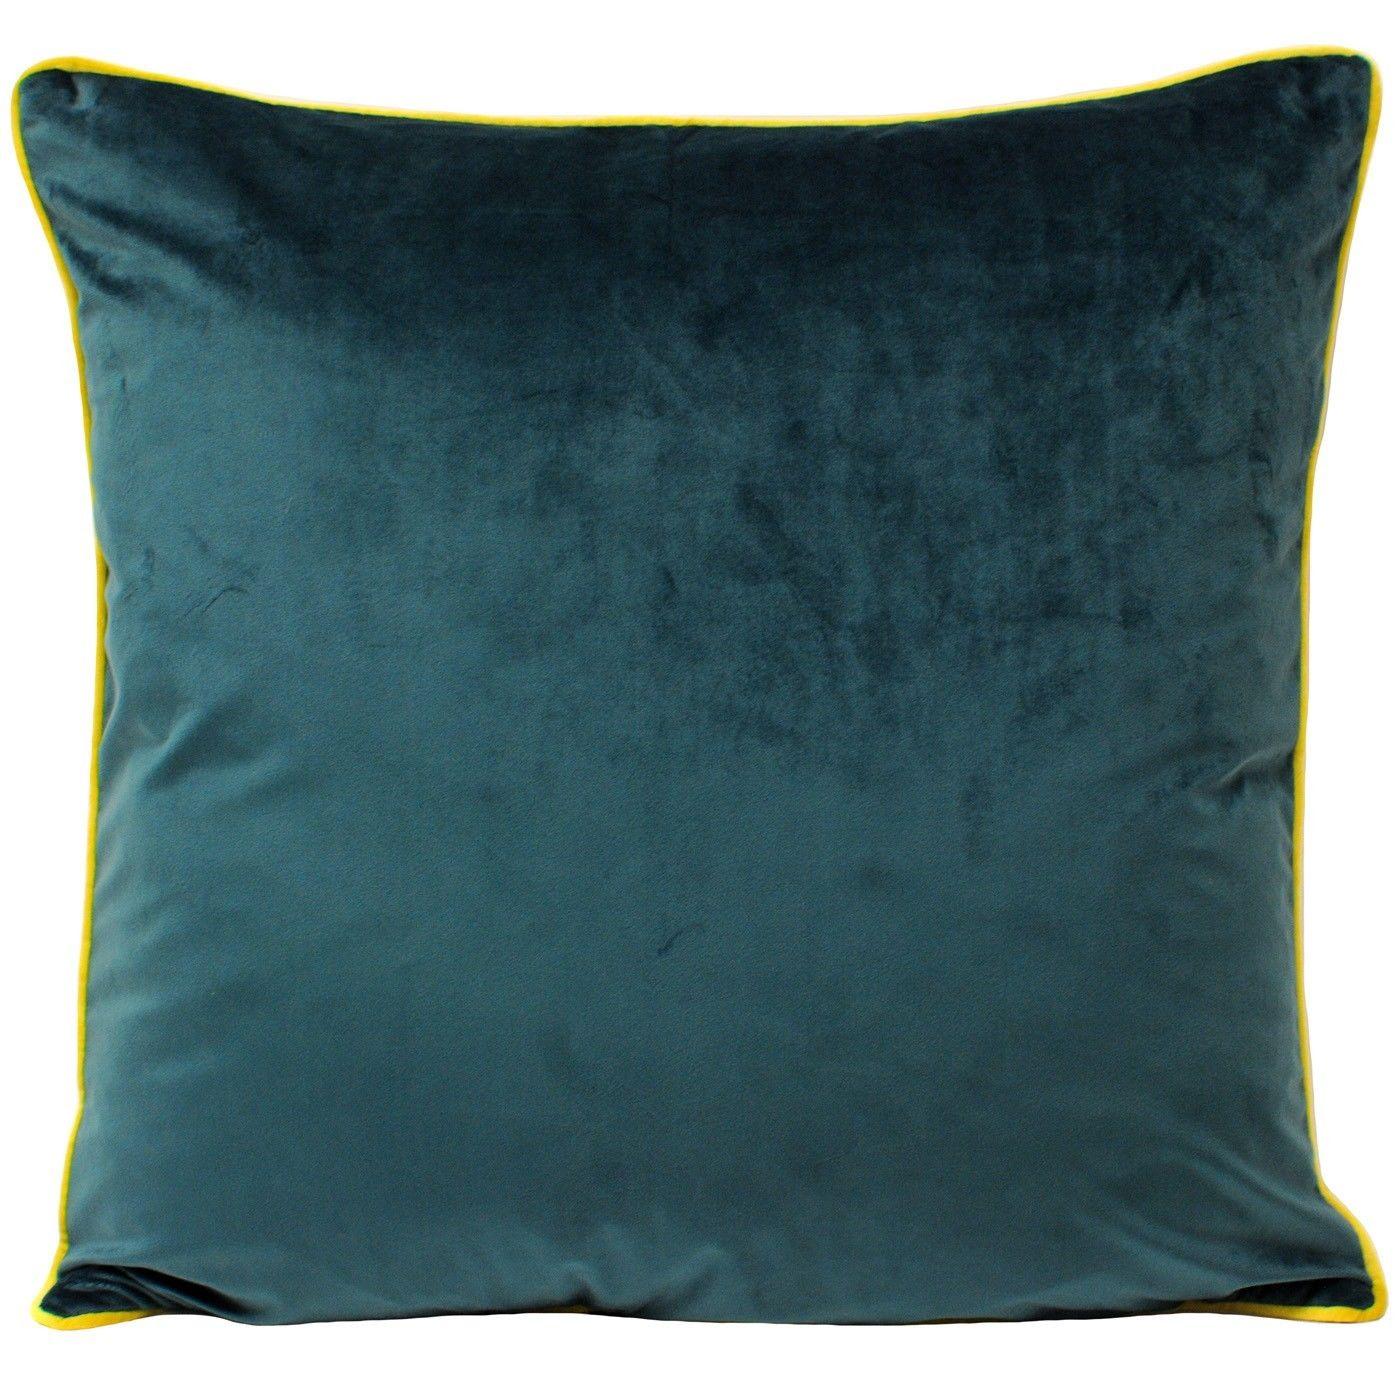 gbp large velvet feel cushion cover teal green with cylon